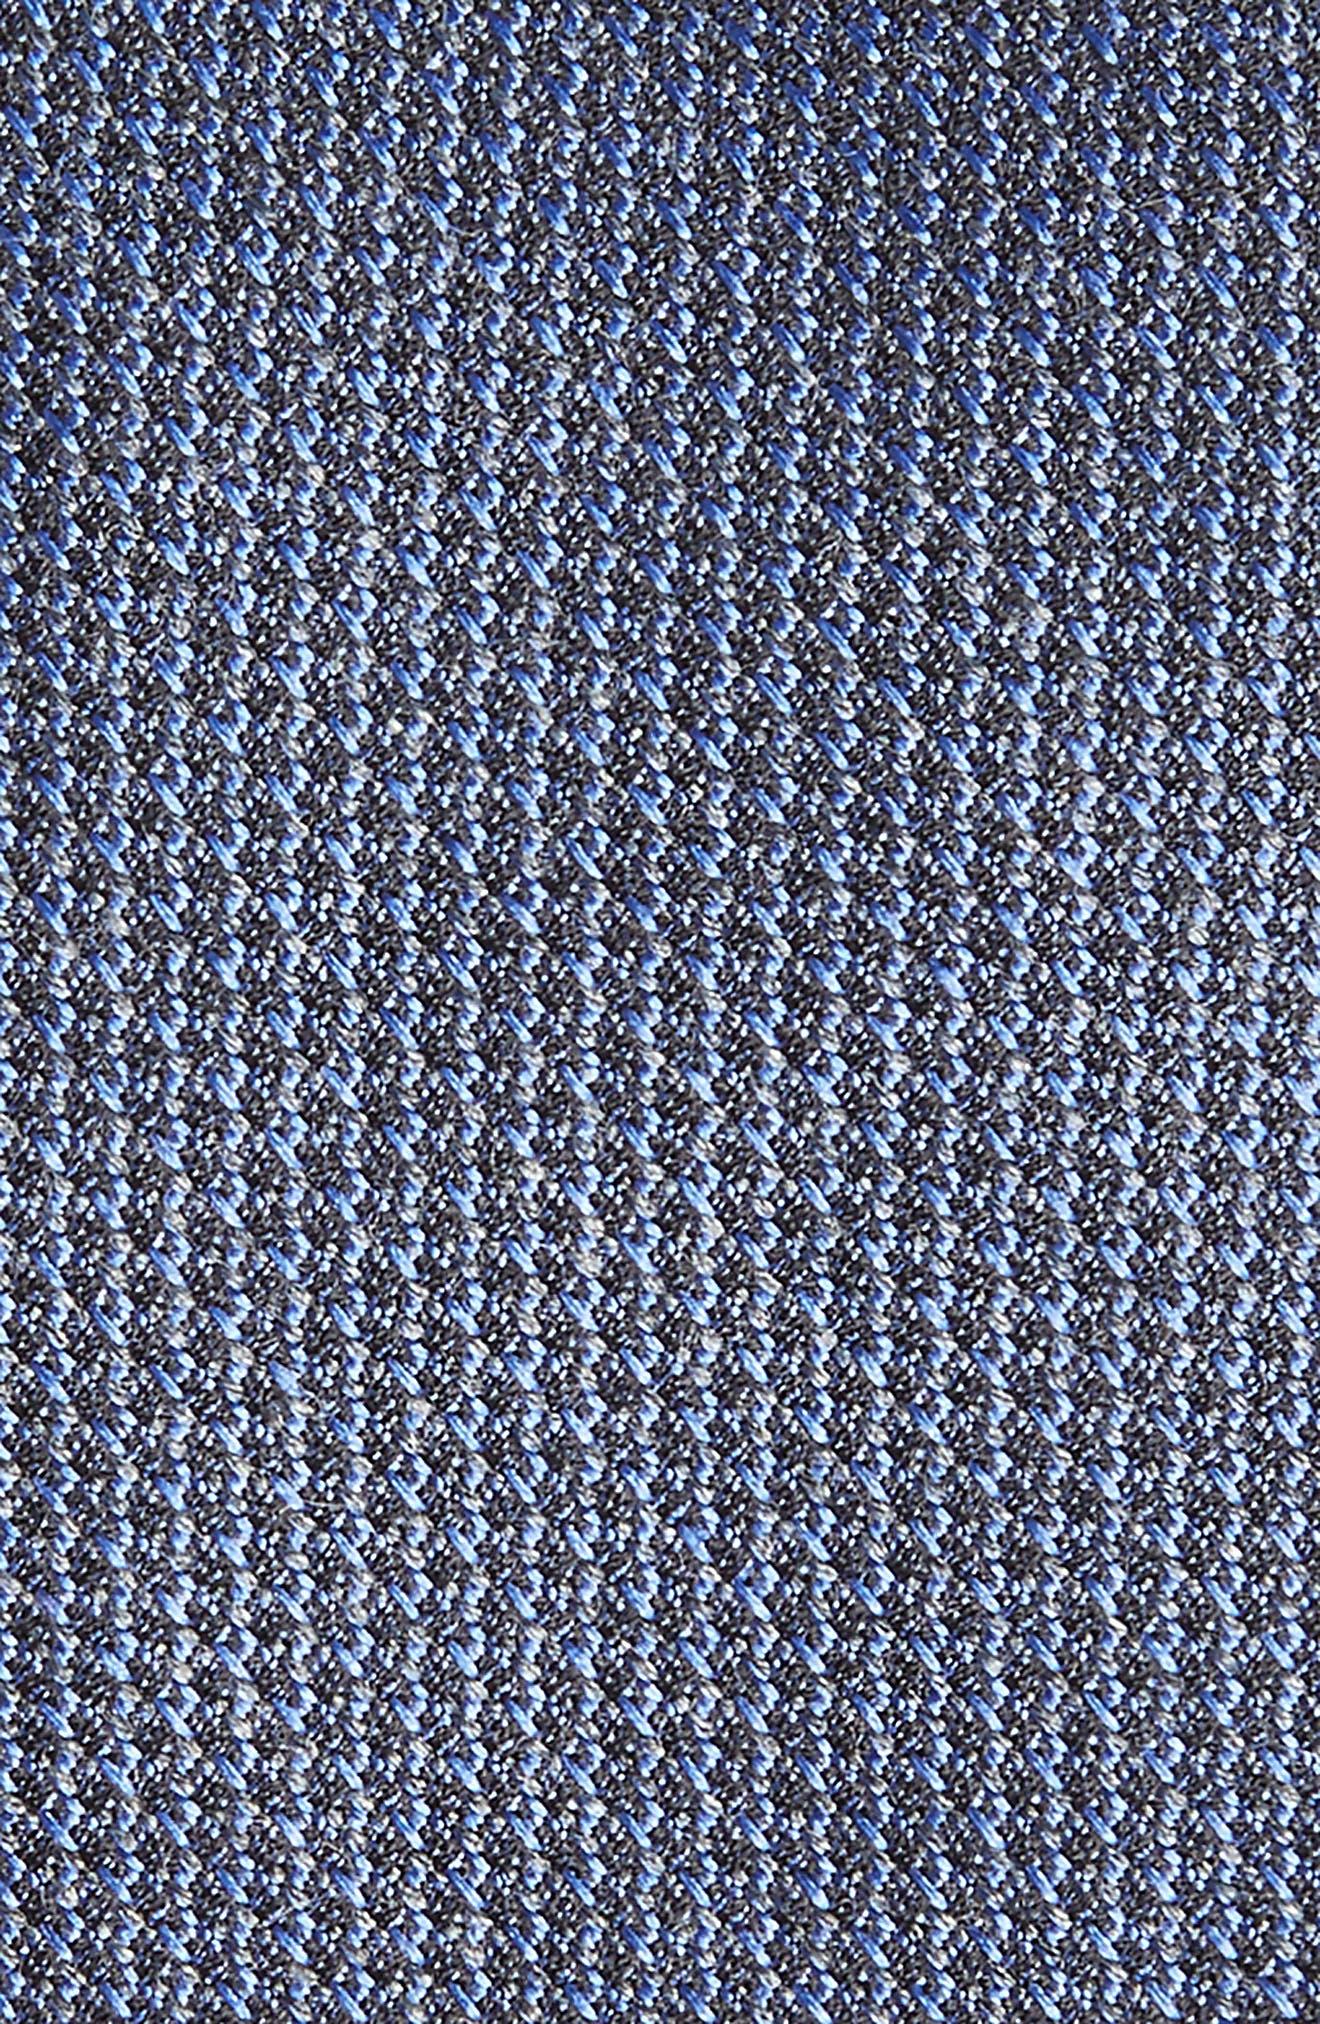 Kenton Textured Silk Blend Skinny Tie,                             Alternate thumbnail 2, color,                             Navy